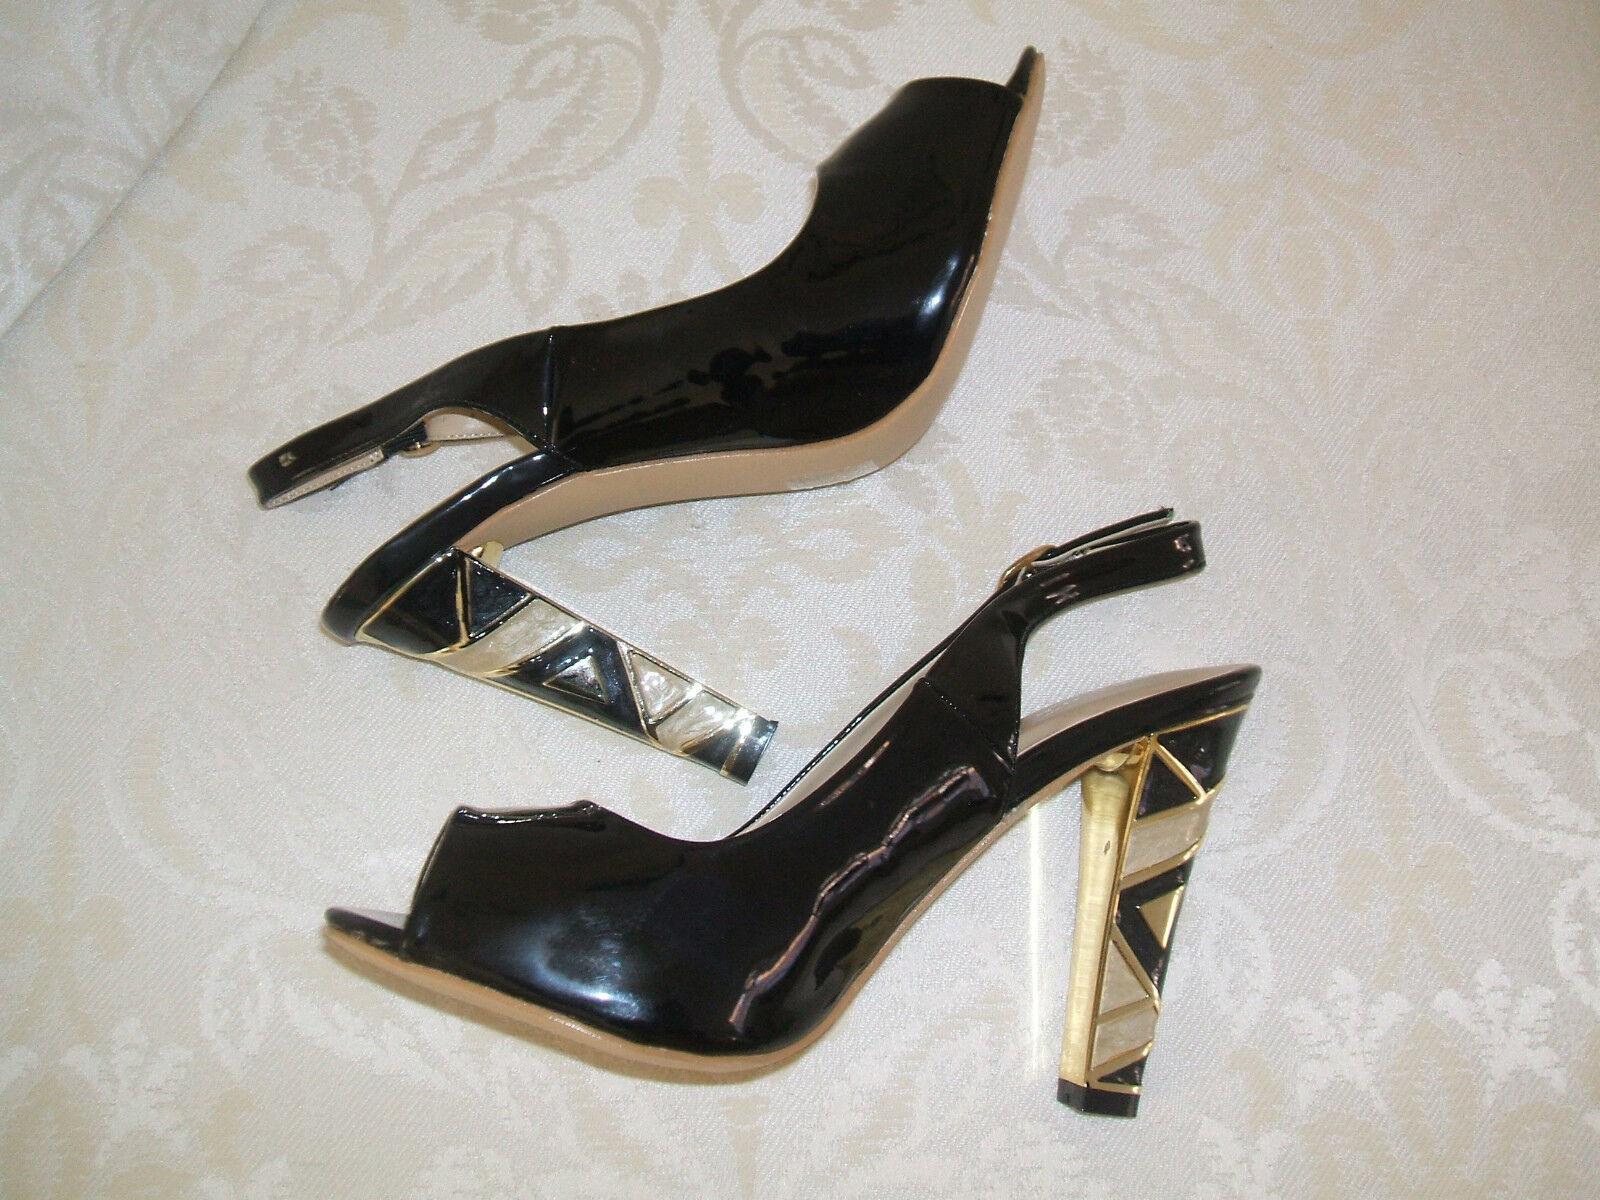 LUNAR FLC419 SIZE 5 OR 6 BLACK IVORY CREAM GOLD PATENT SLINGBACK Schuhe SANDALS